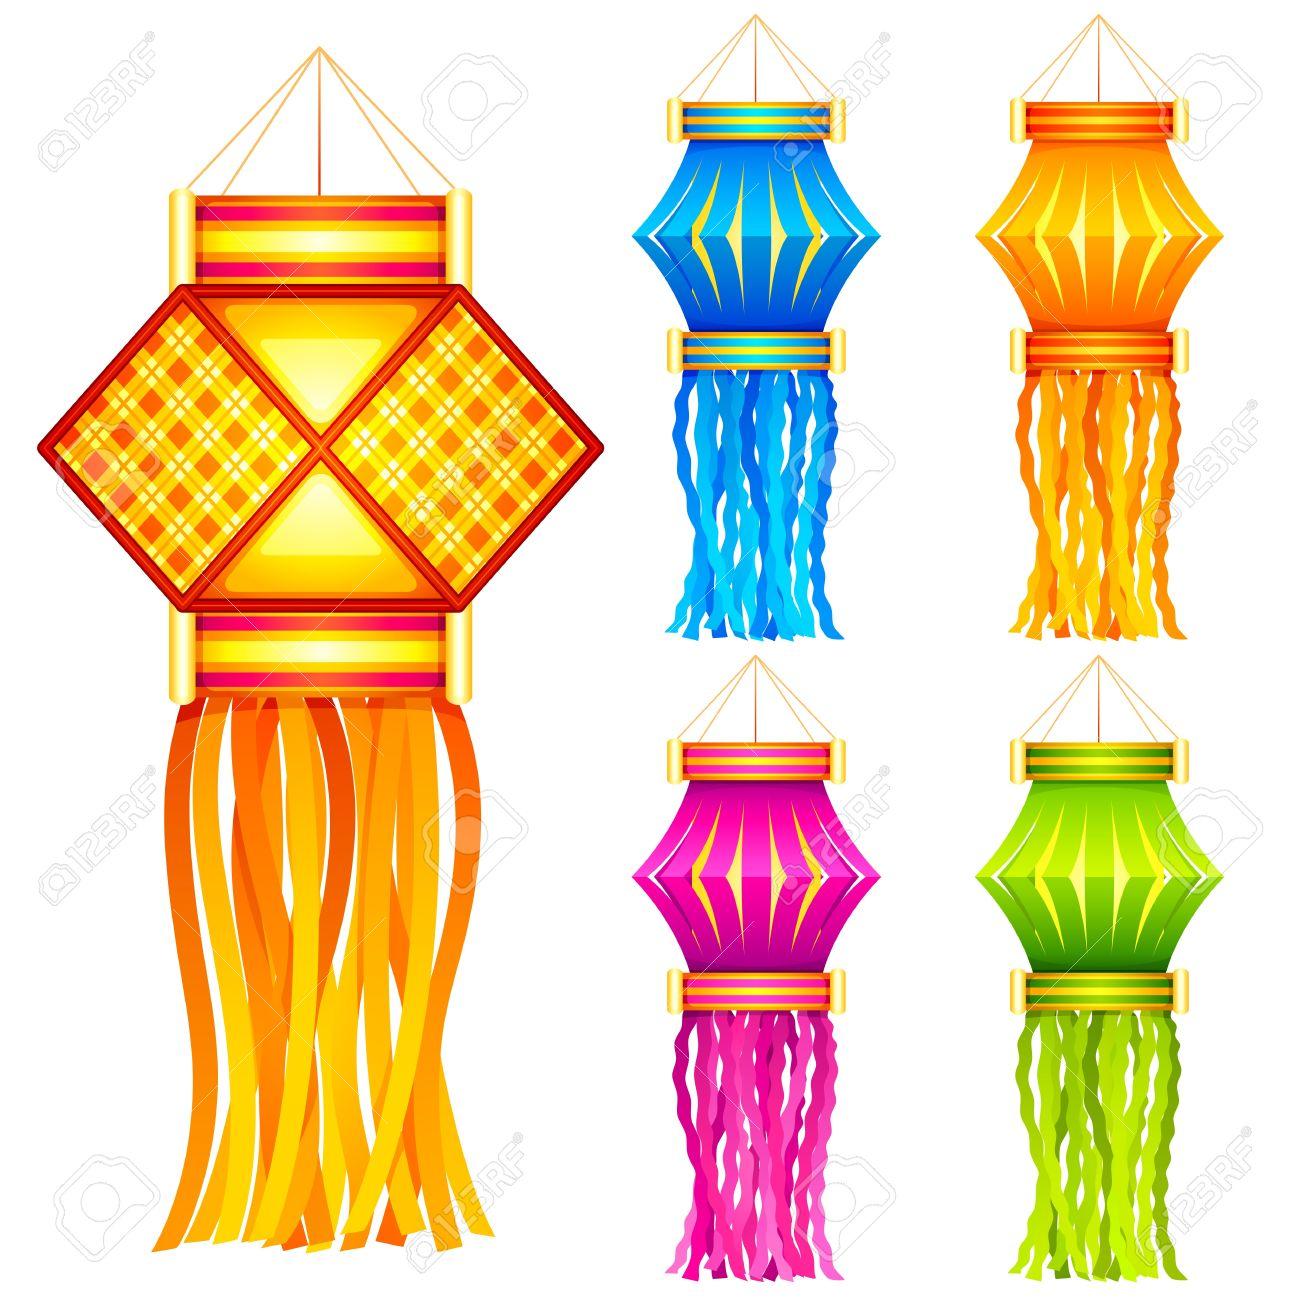 Diwali Hanging Lantern Royalty Free Cliparts, Vectors, And Stock ... for Diwali Lantern Png  110zmd